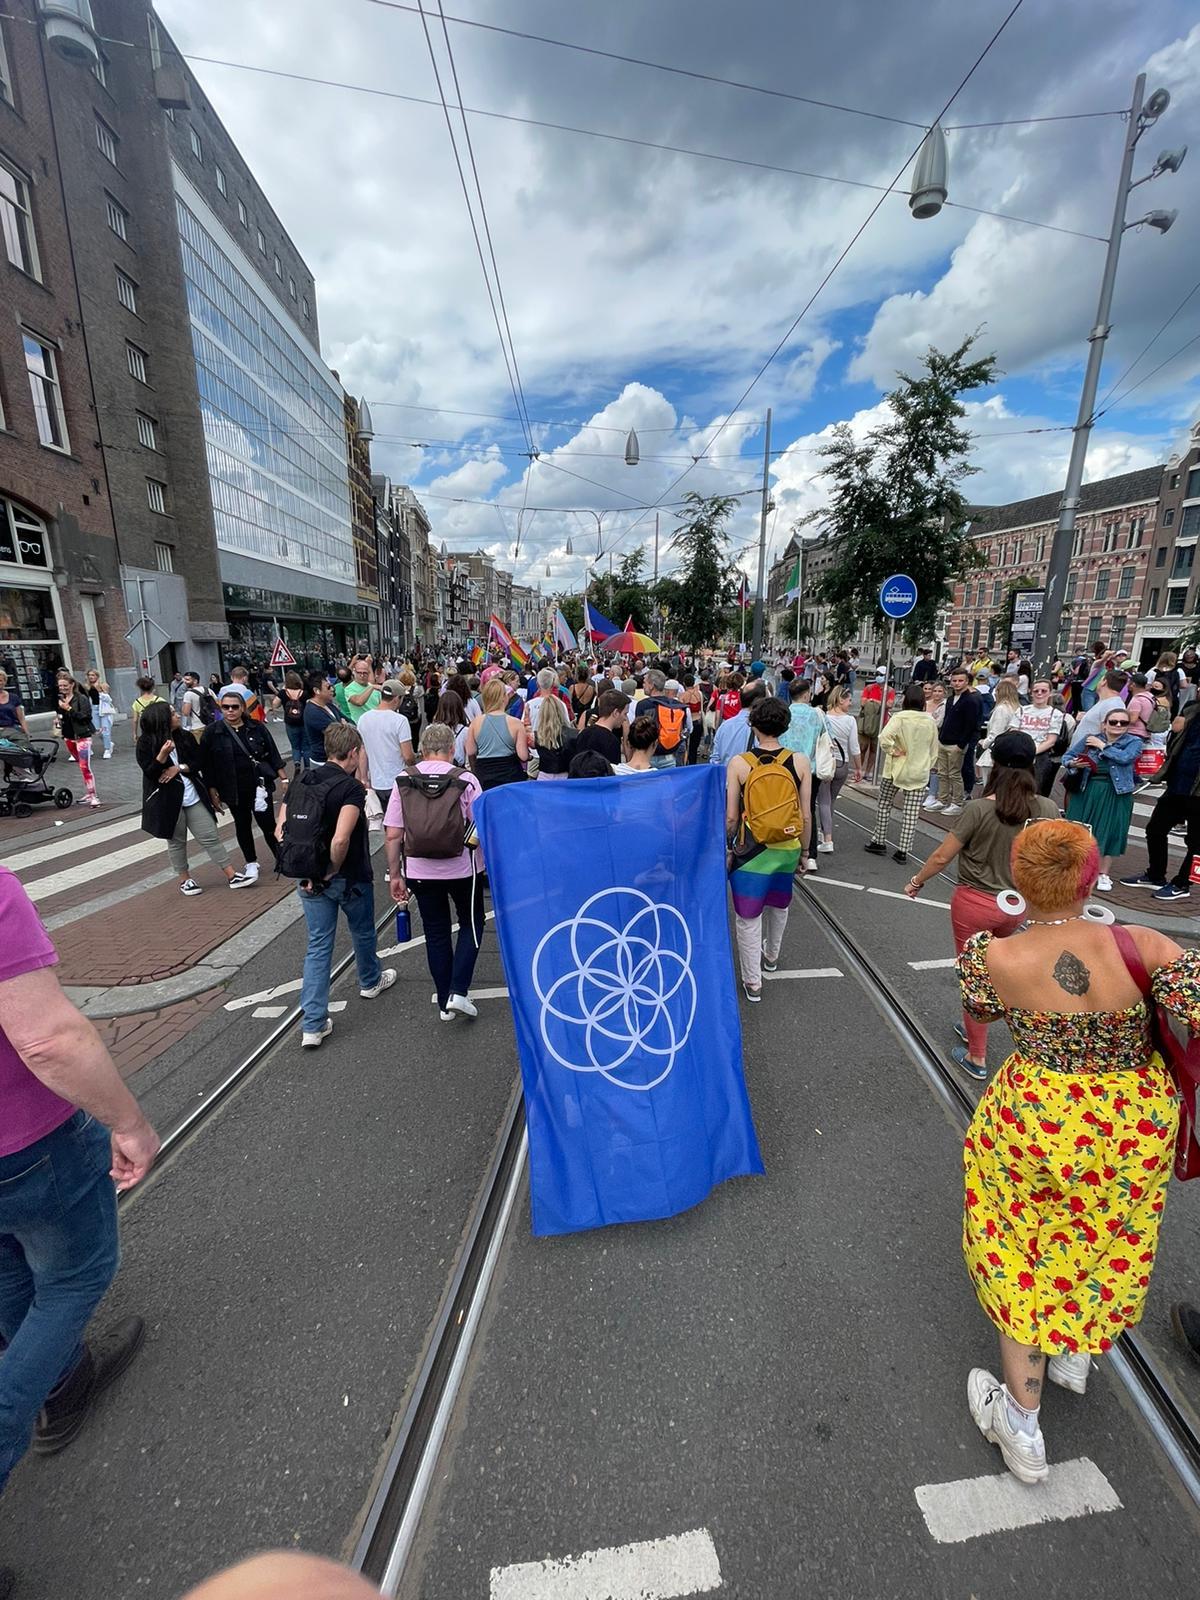 Blue flag with white symbol